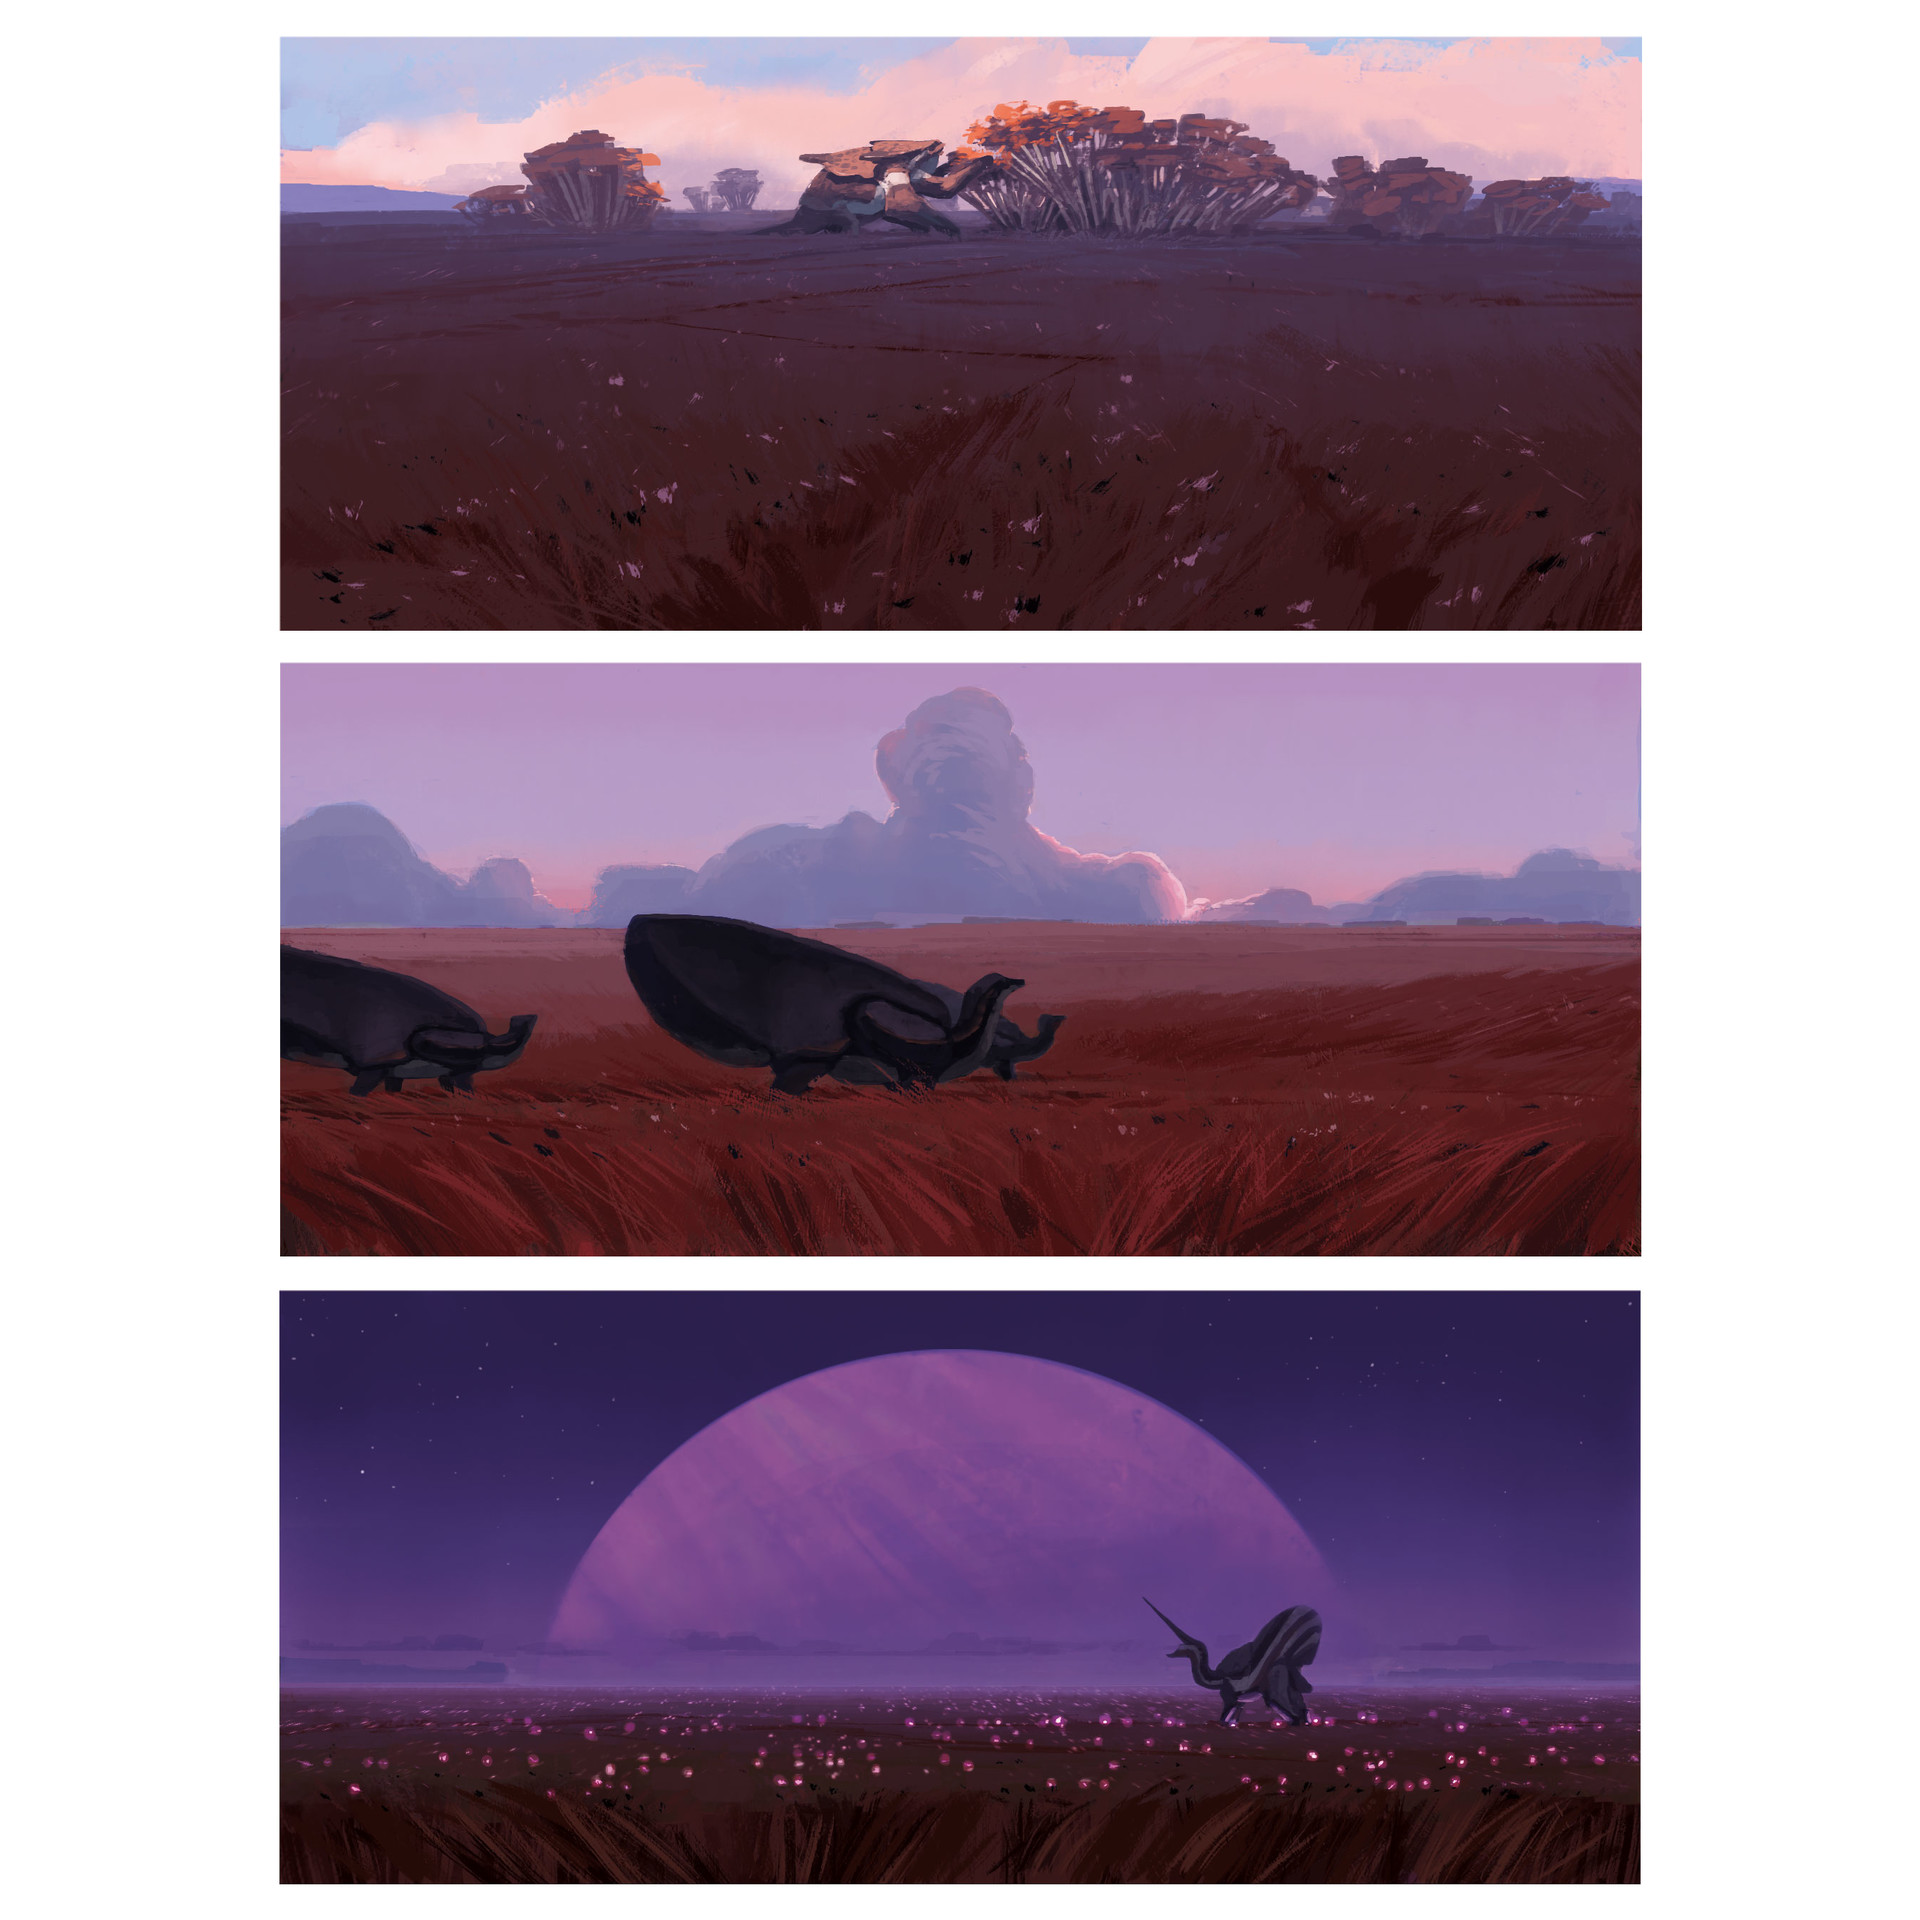 [Reflexion] Les oeuvres qui vous inspirent Alexander-ostrowski-05-grassland-colorroughs-insta1